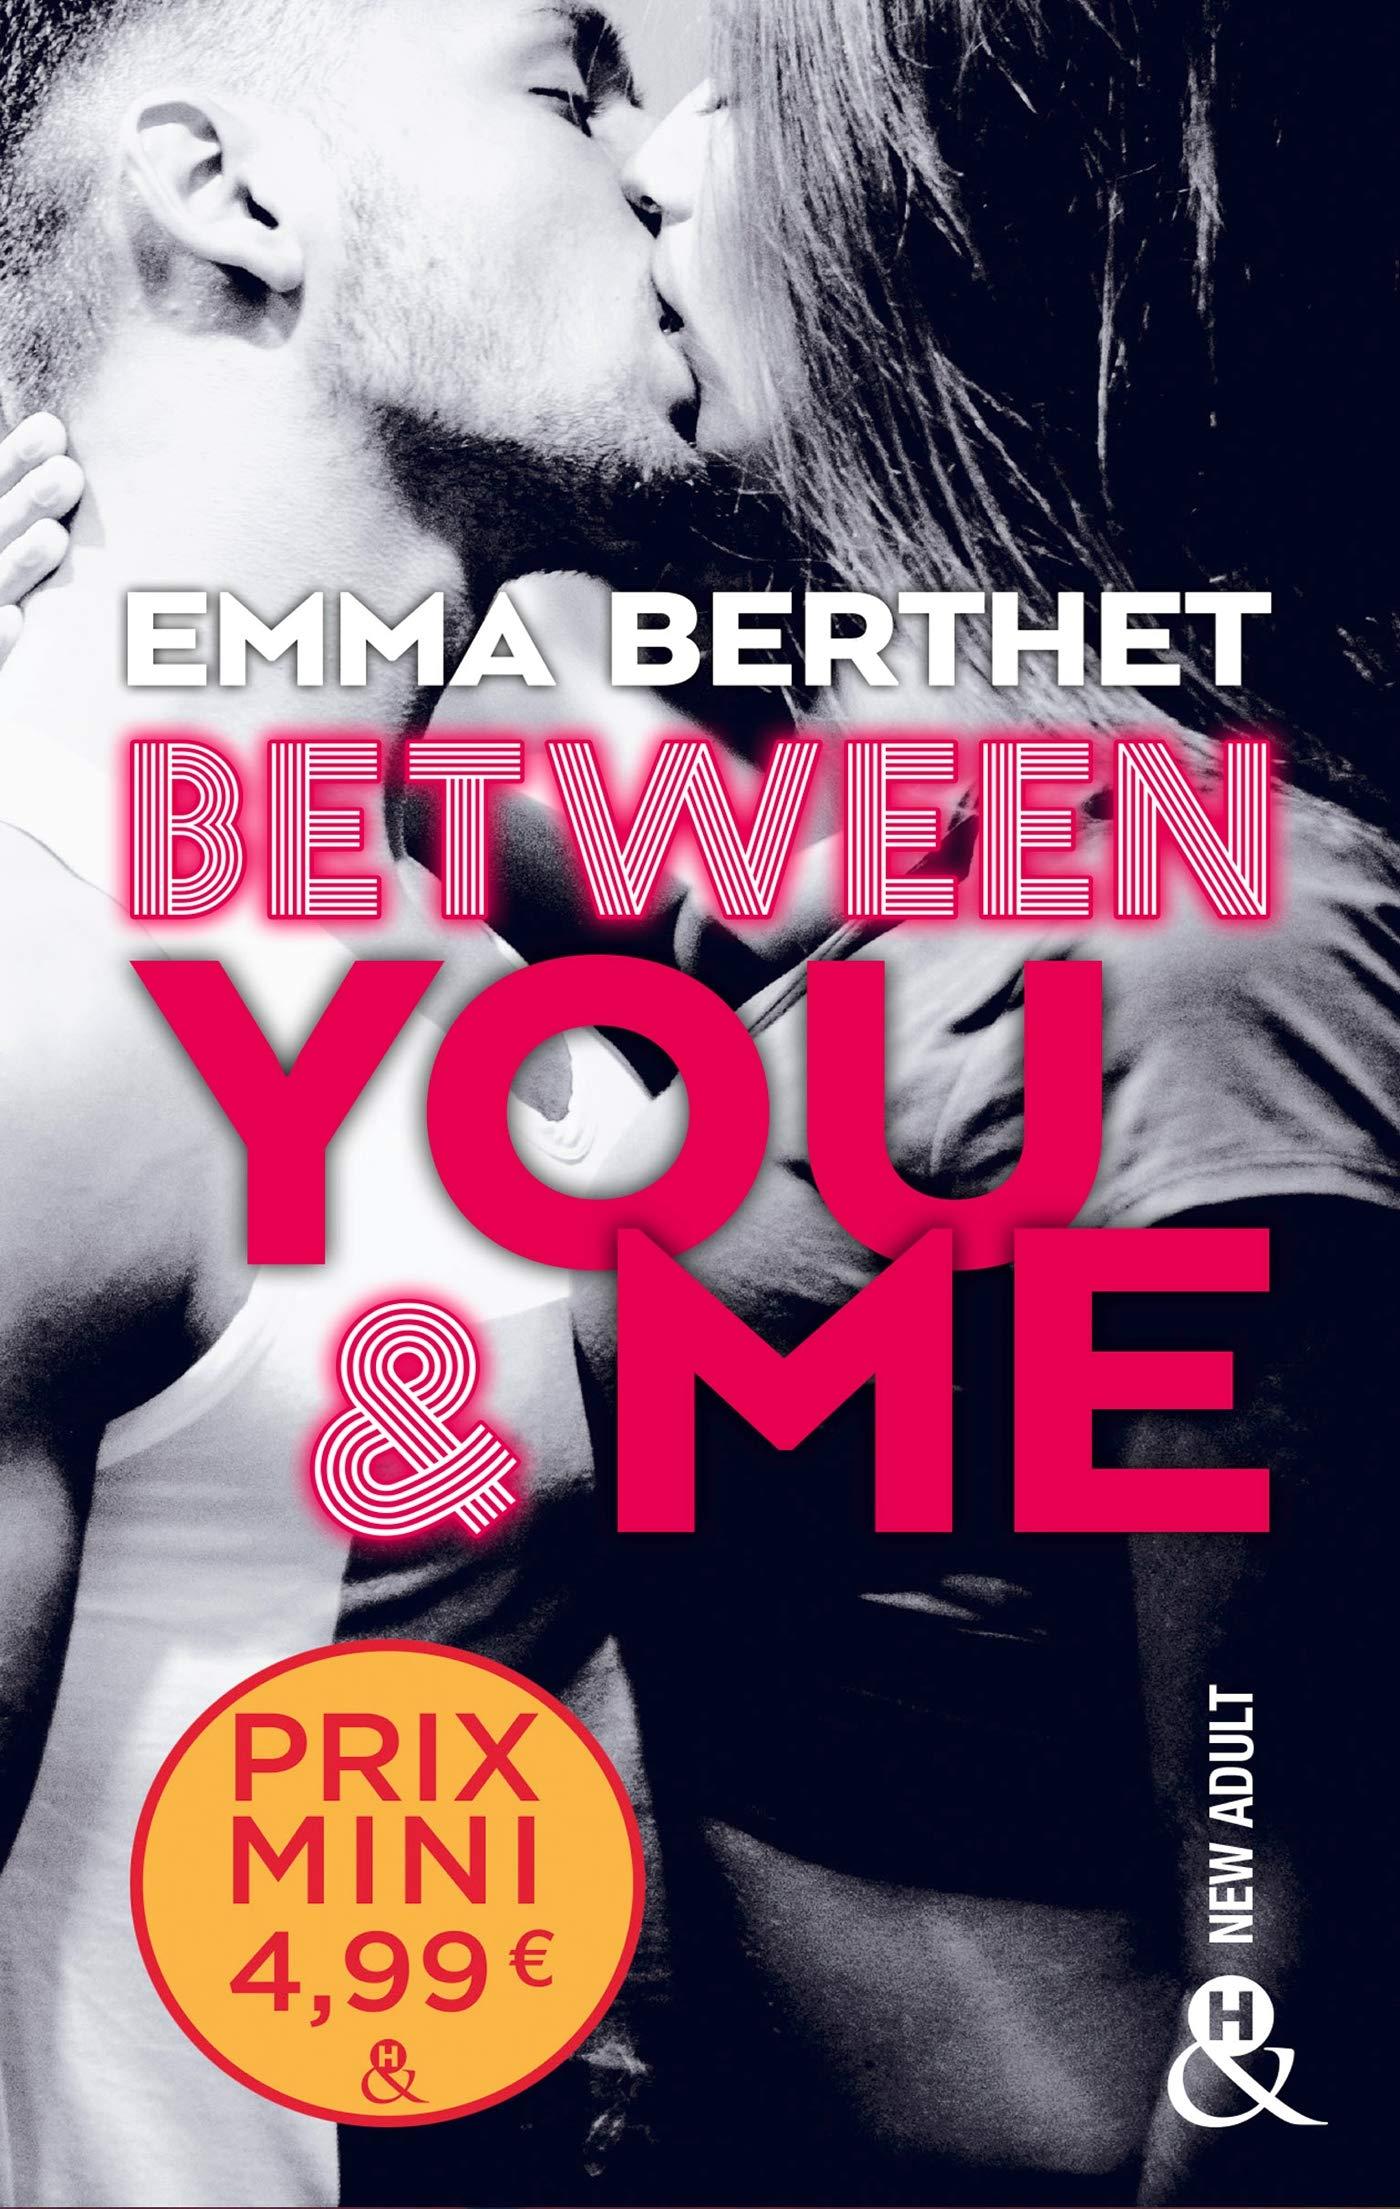 Between you and me de Emma Berthet 81fhmz11